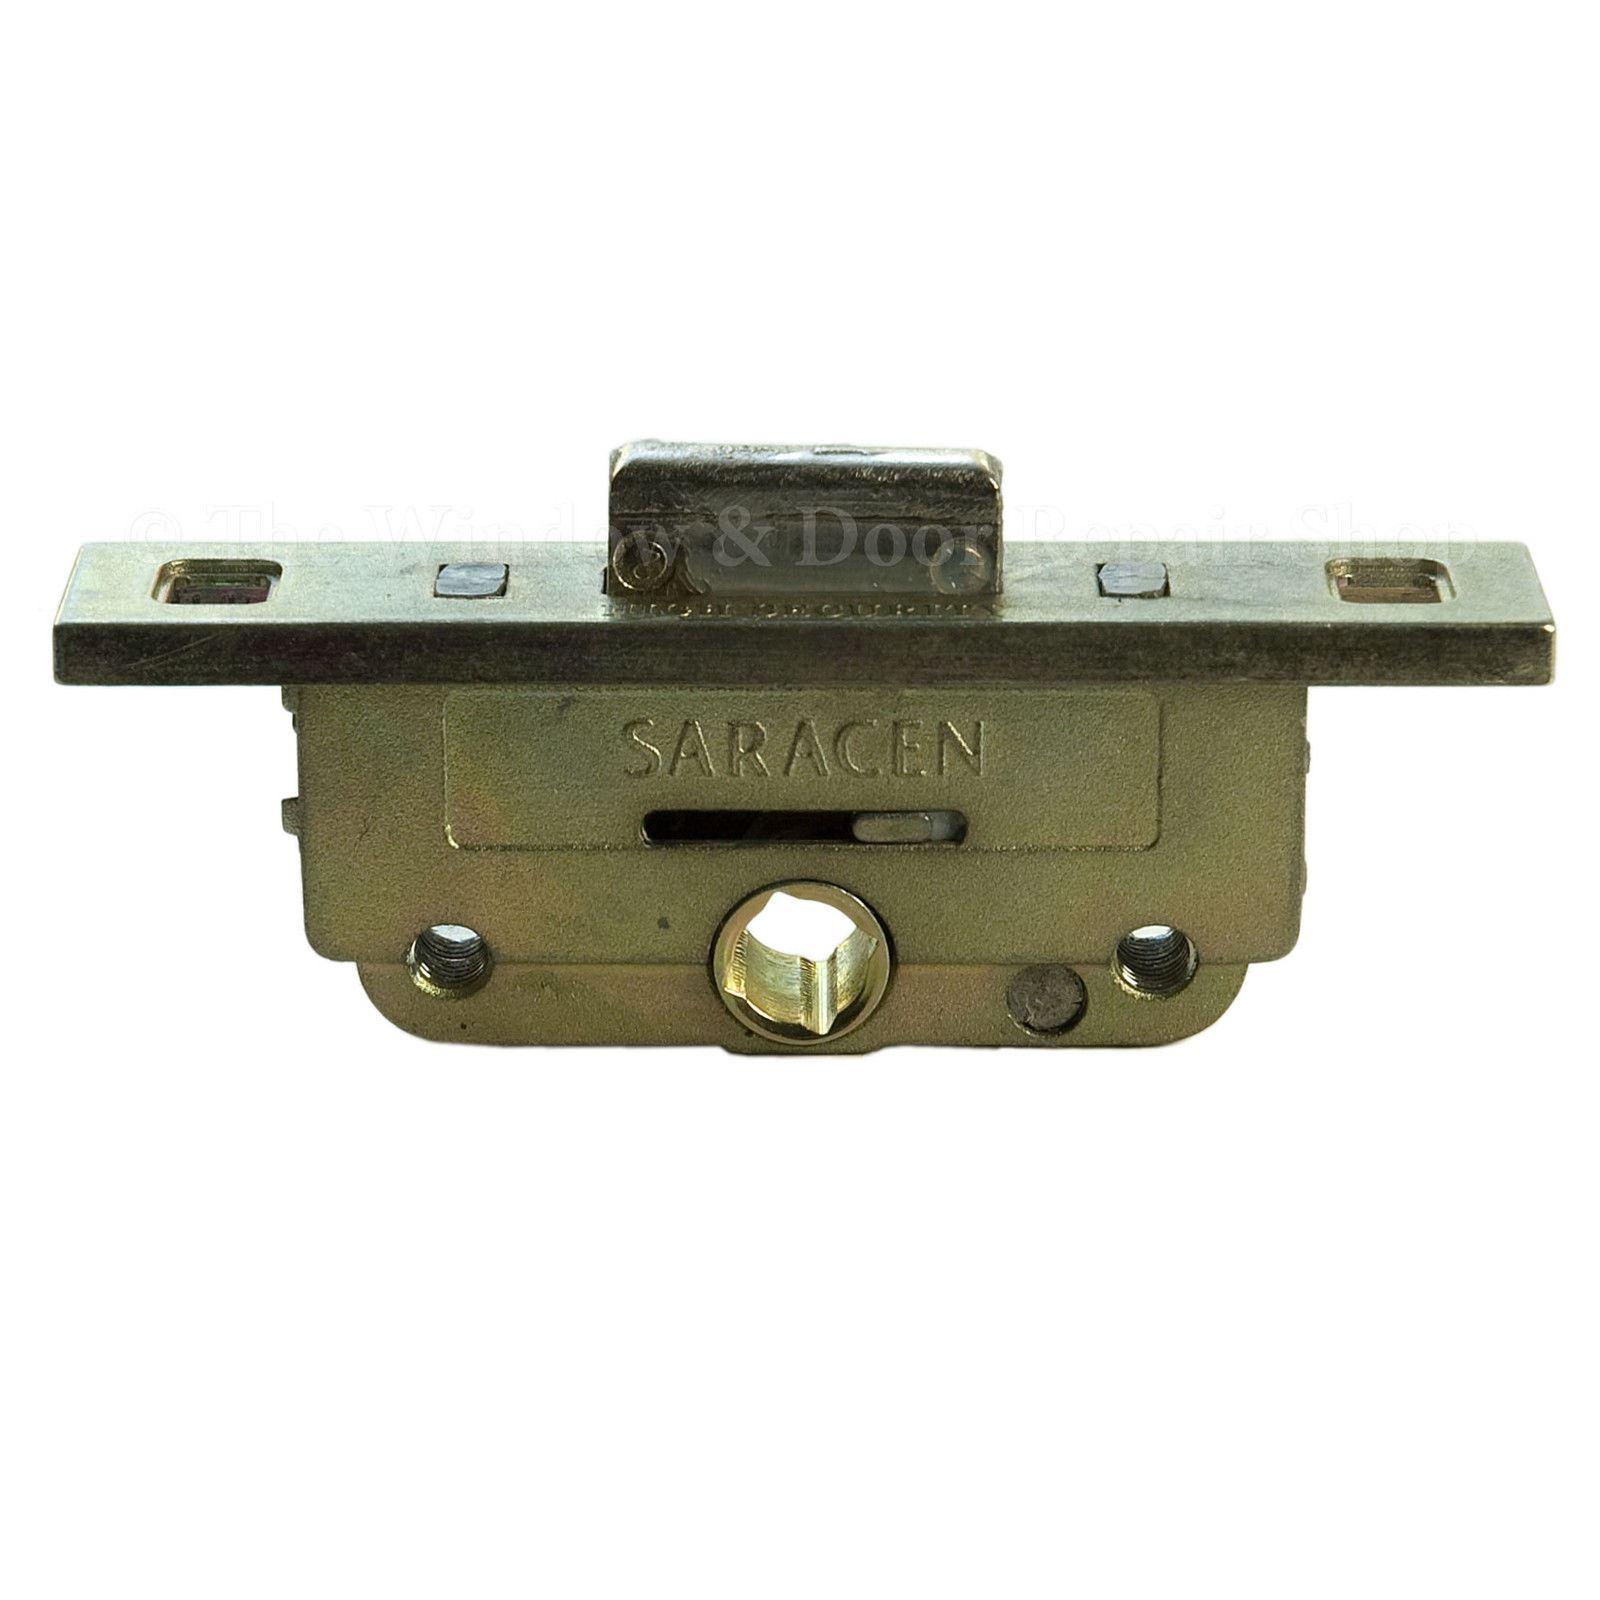 Laird saracen shootbolt deadlock gearbox mechanism upvc for Upvc window locks